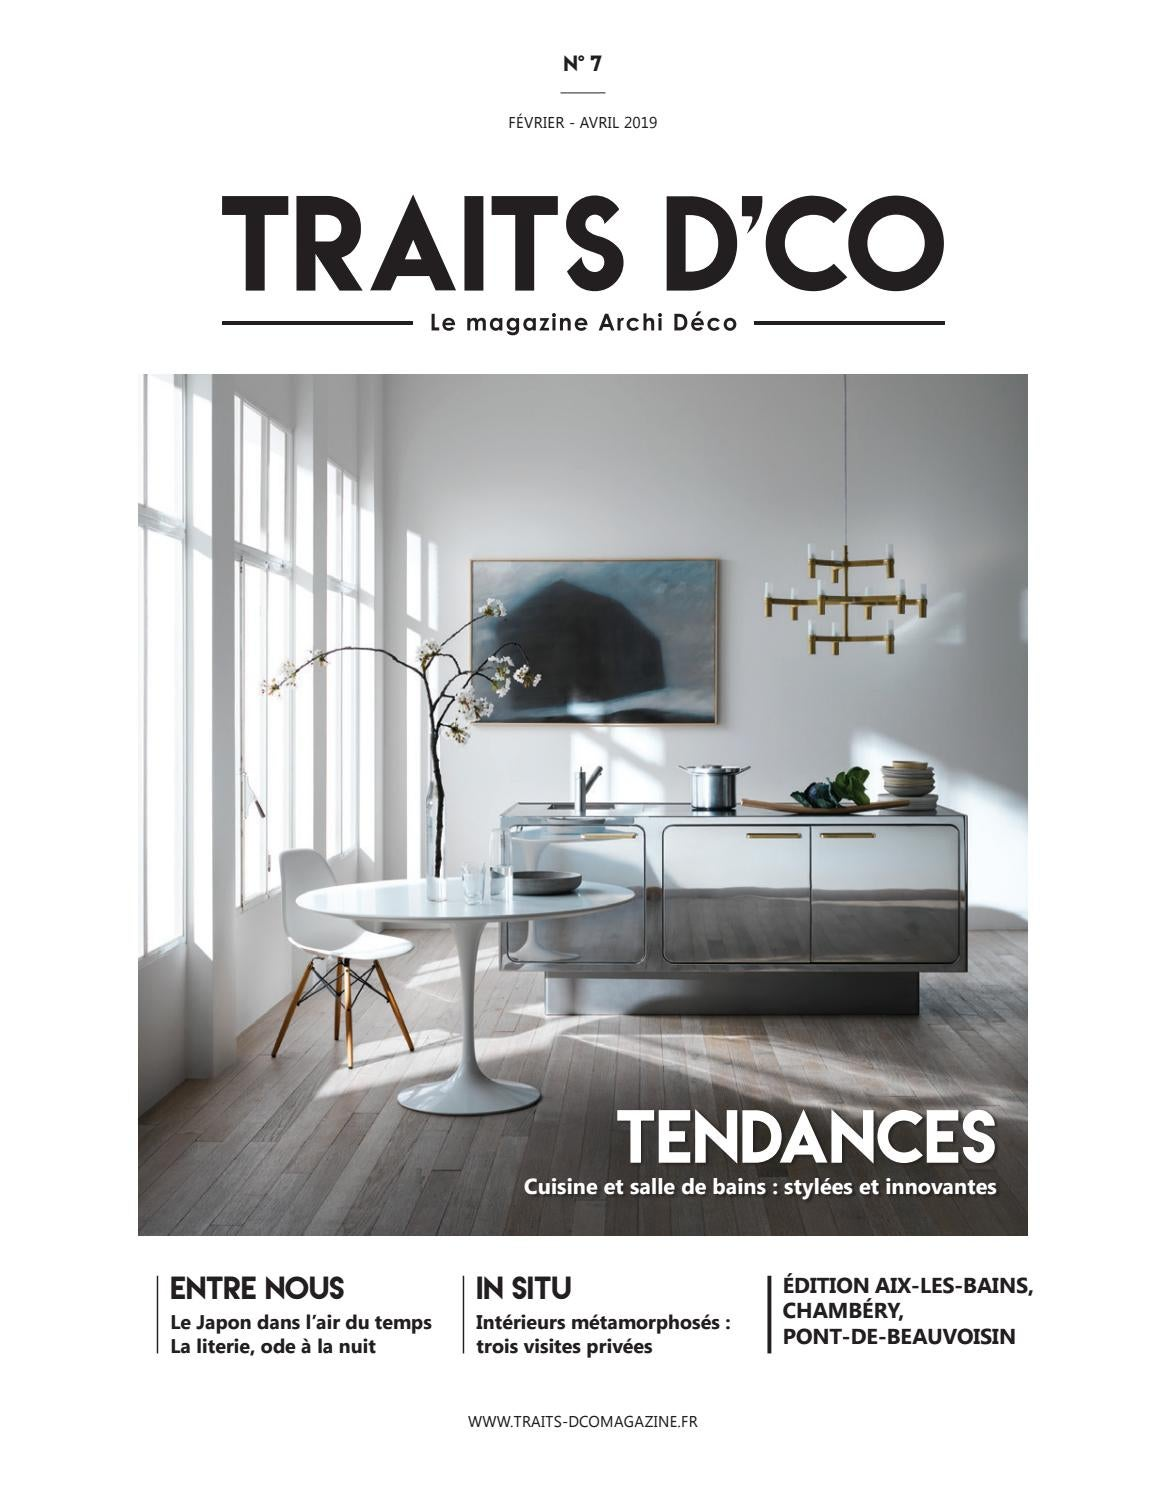 Traits Dco Magazine Aix Les Bains Chambery Pont De